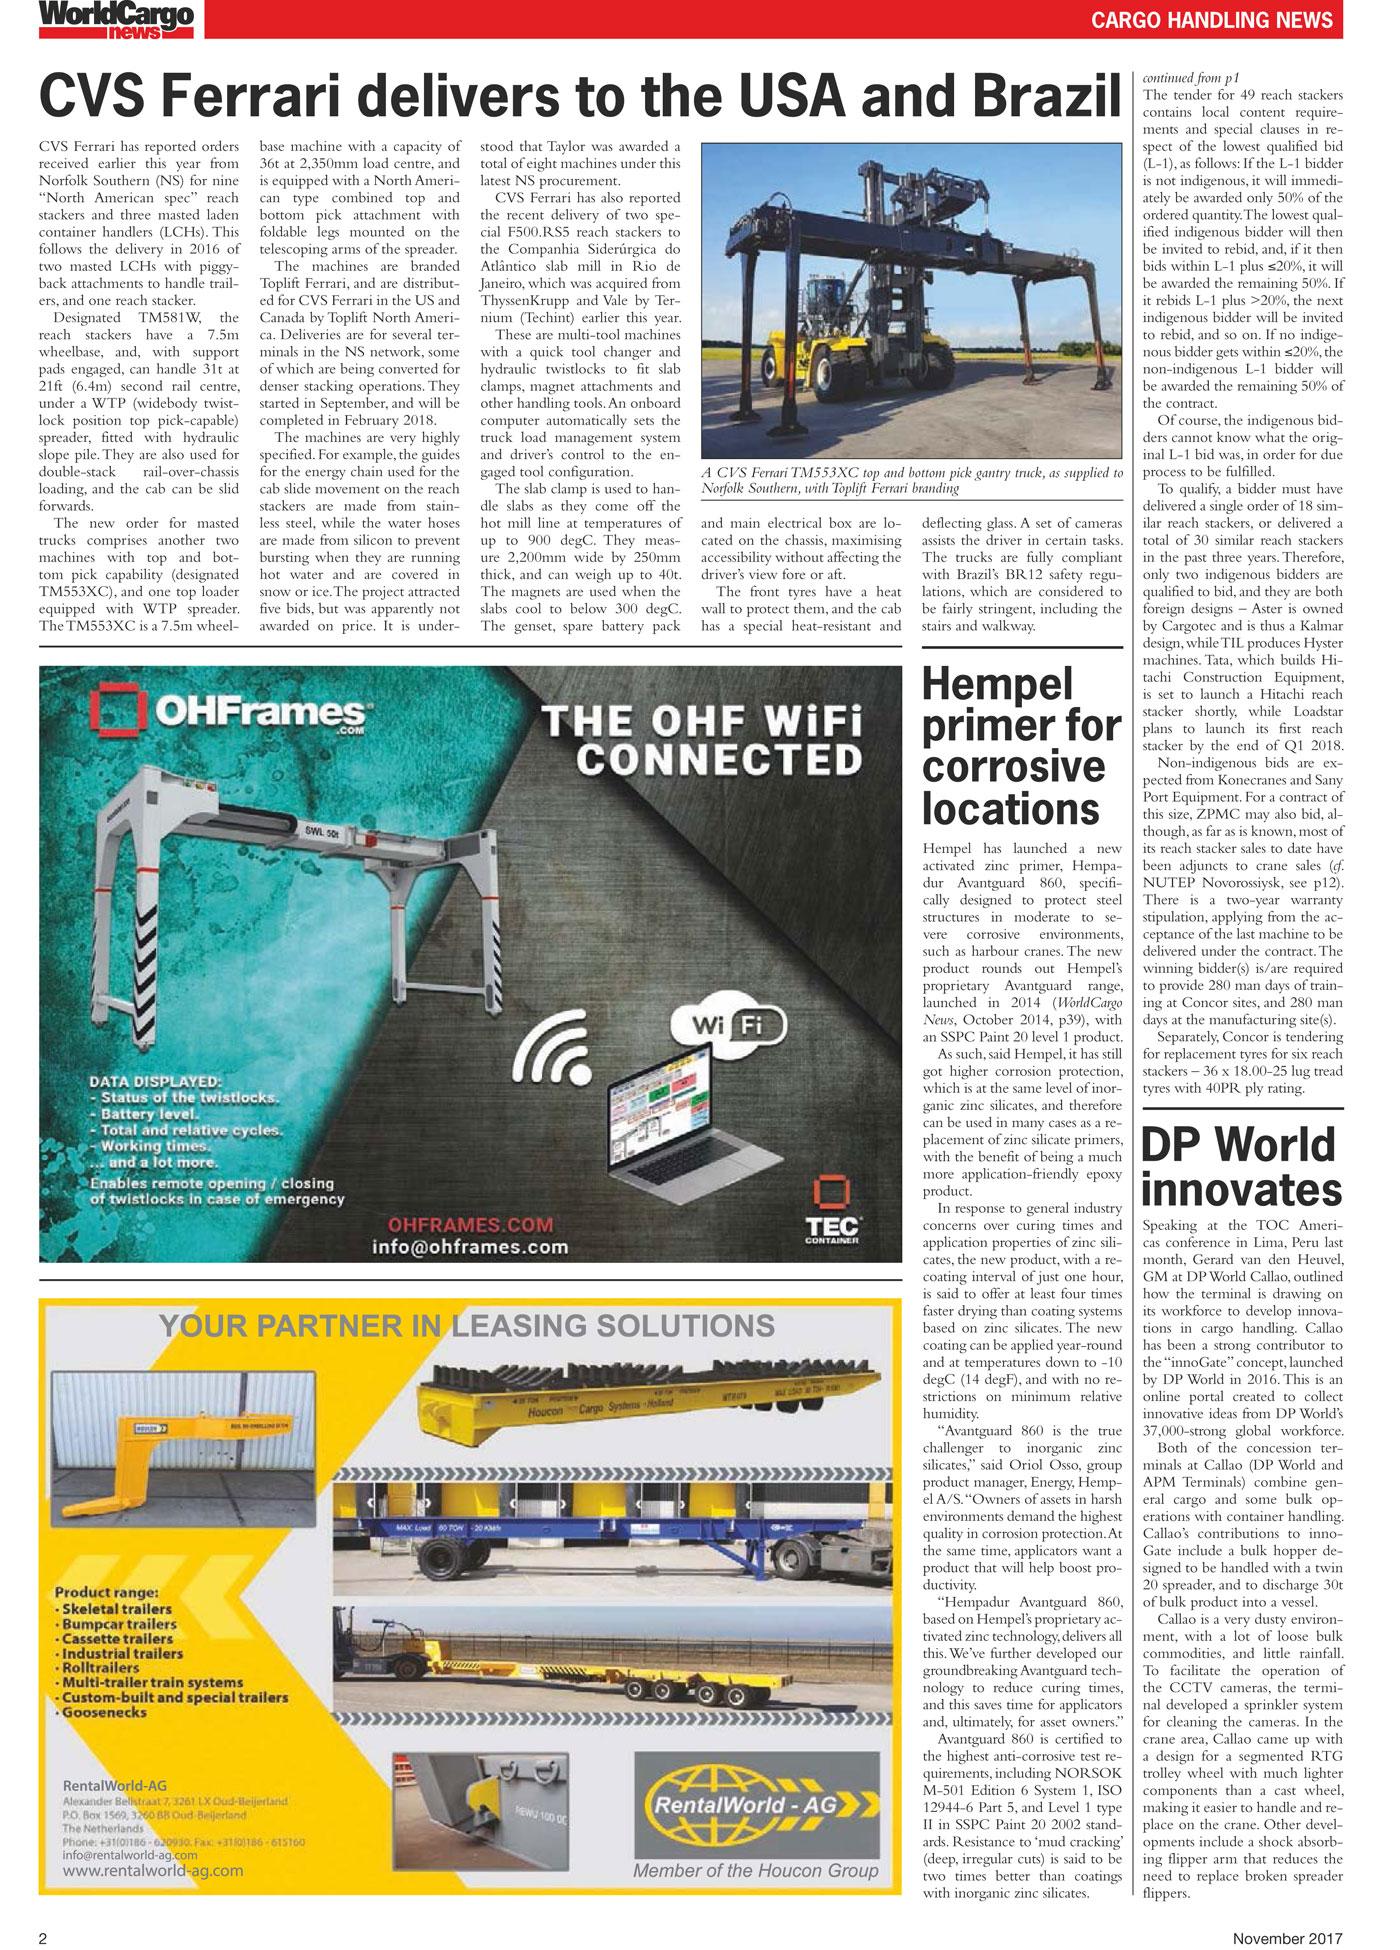 In the press - CVS ferrari worldcargonews november 2017